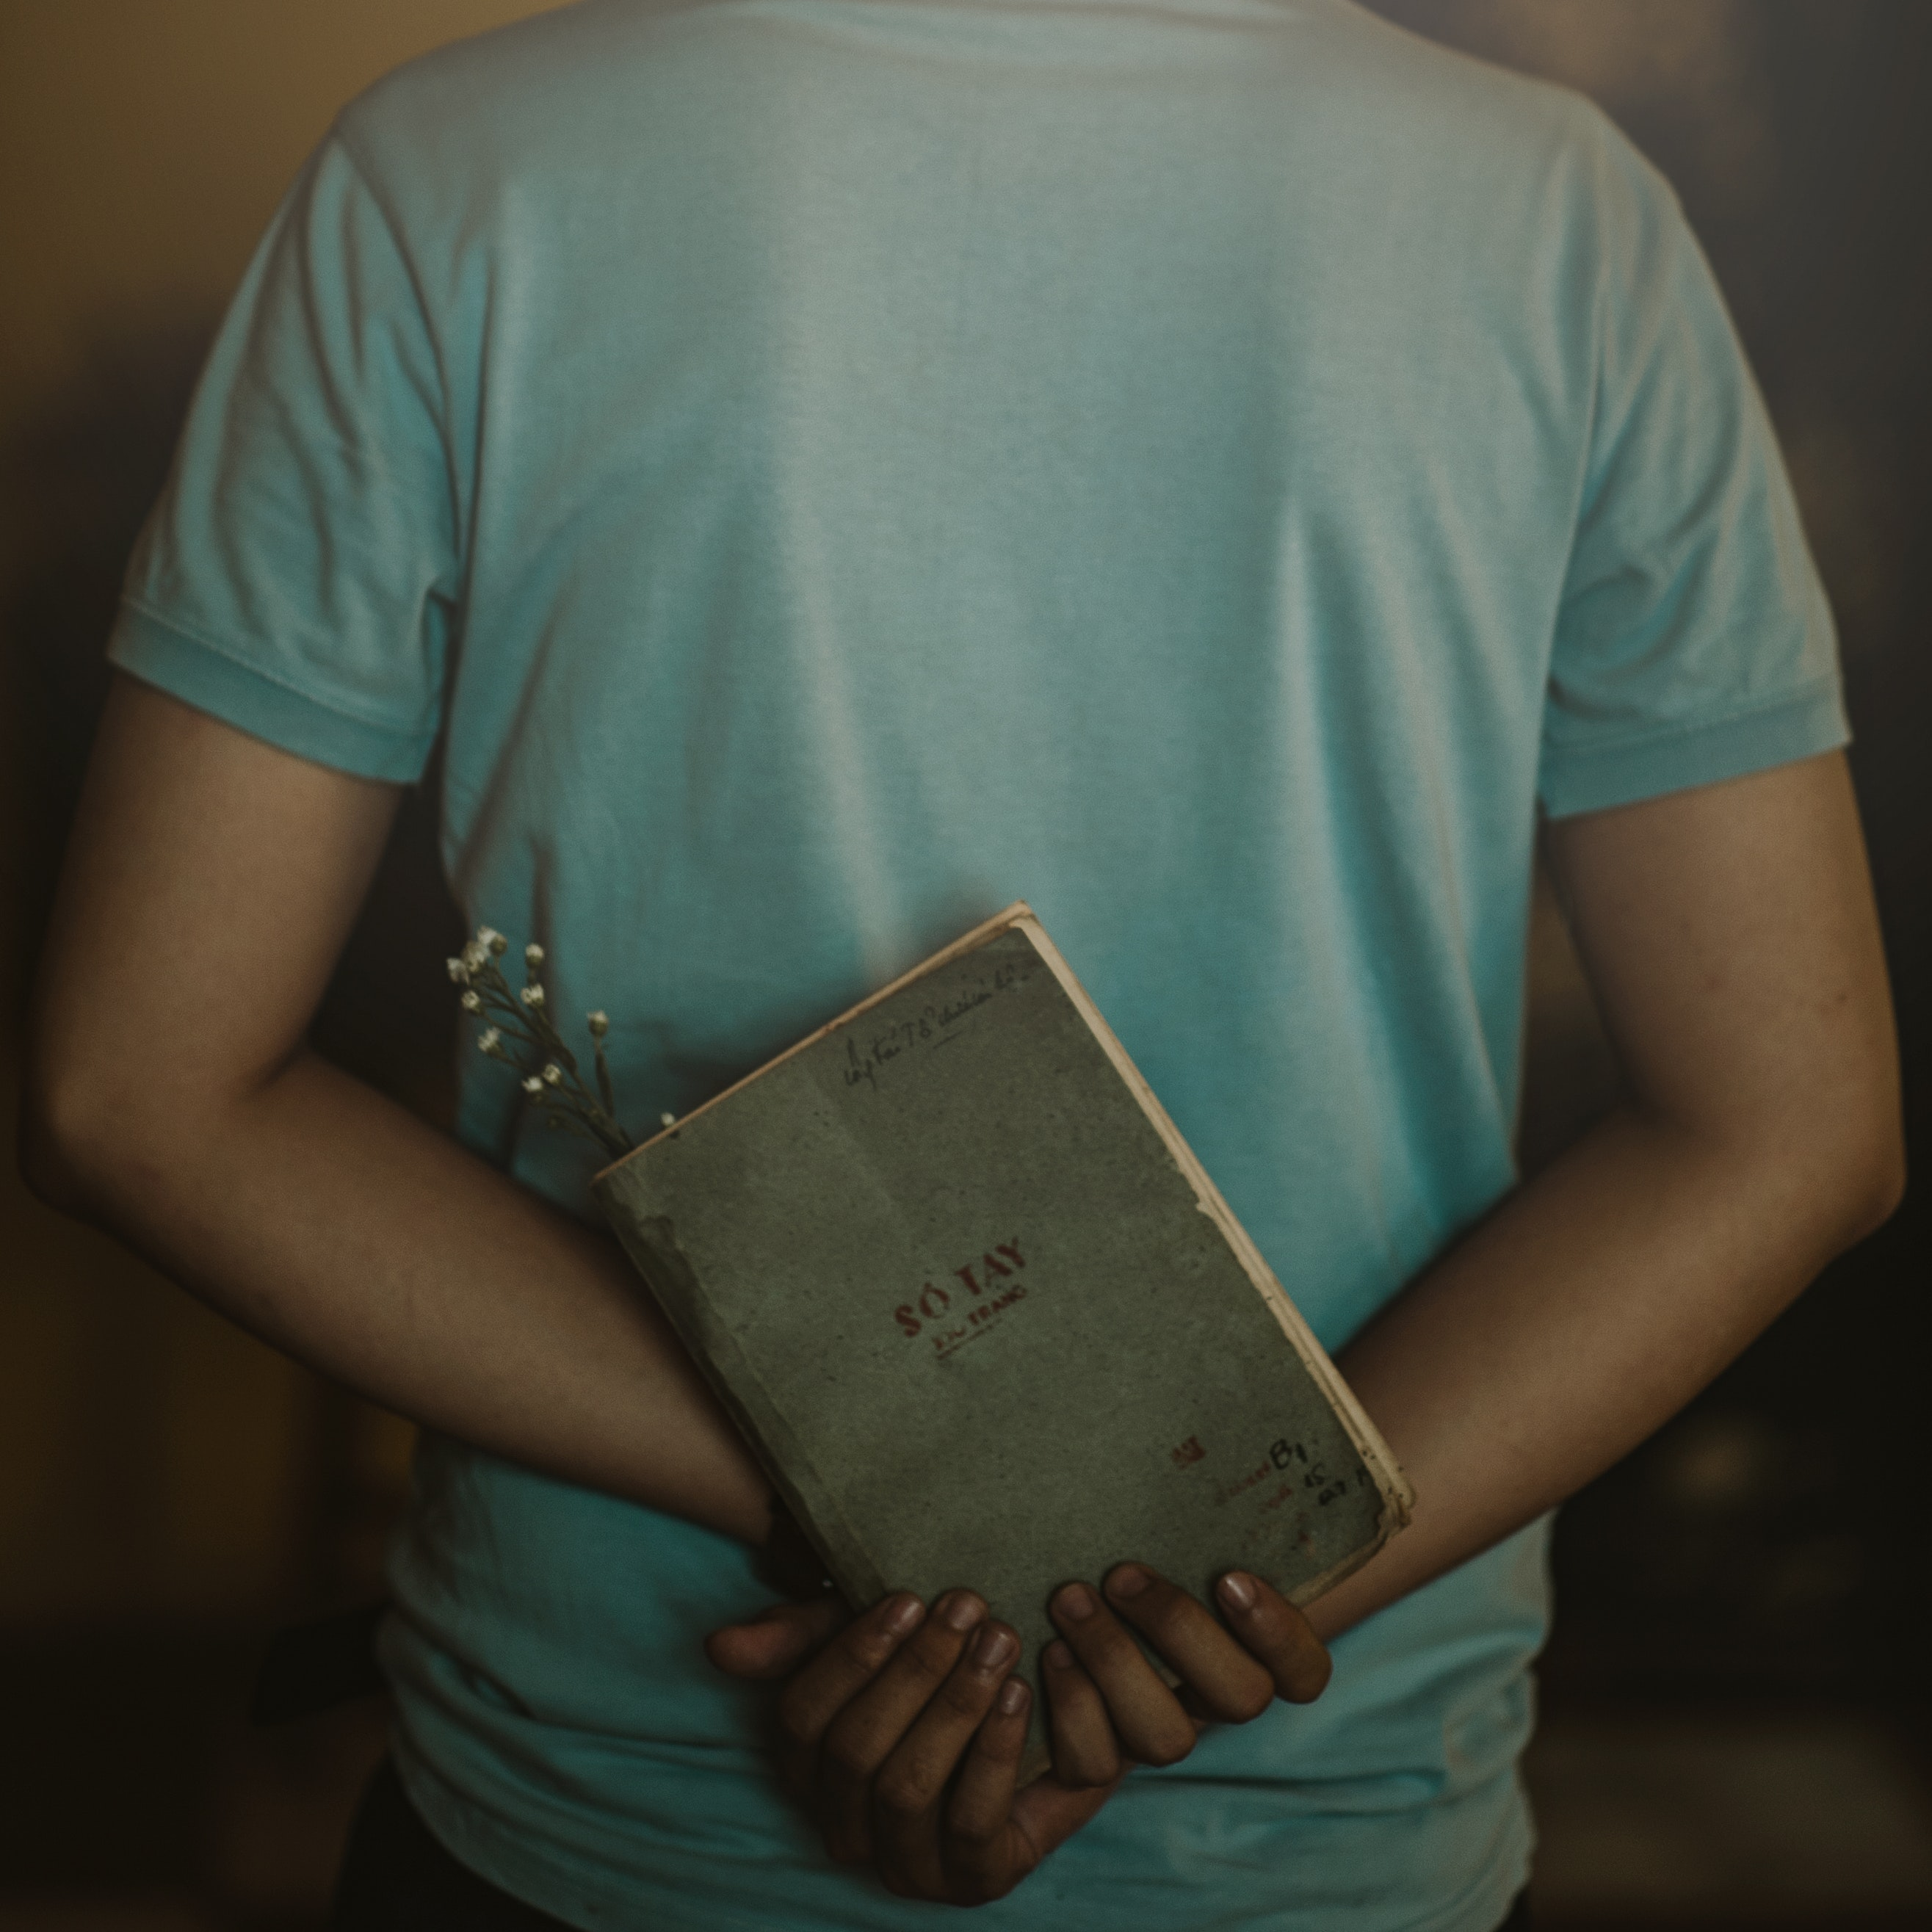 Man wearing t-shirt holding book photo